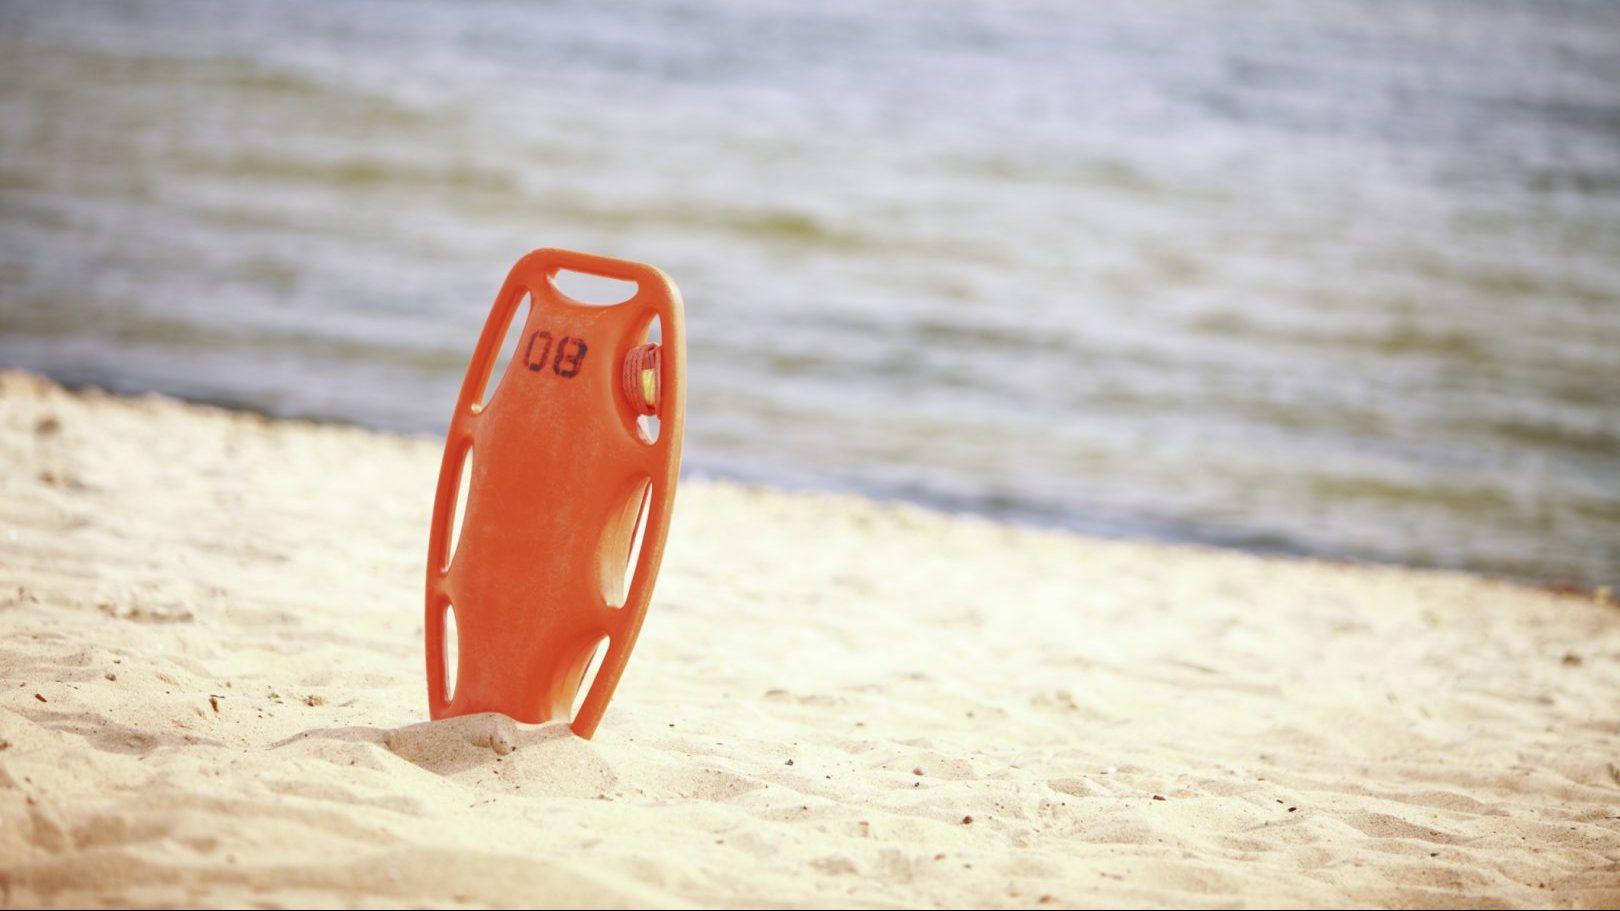 Lifeguard rescue buoy